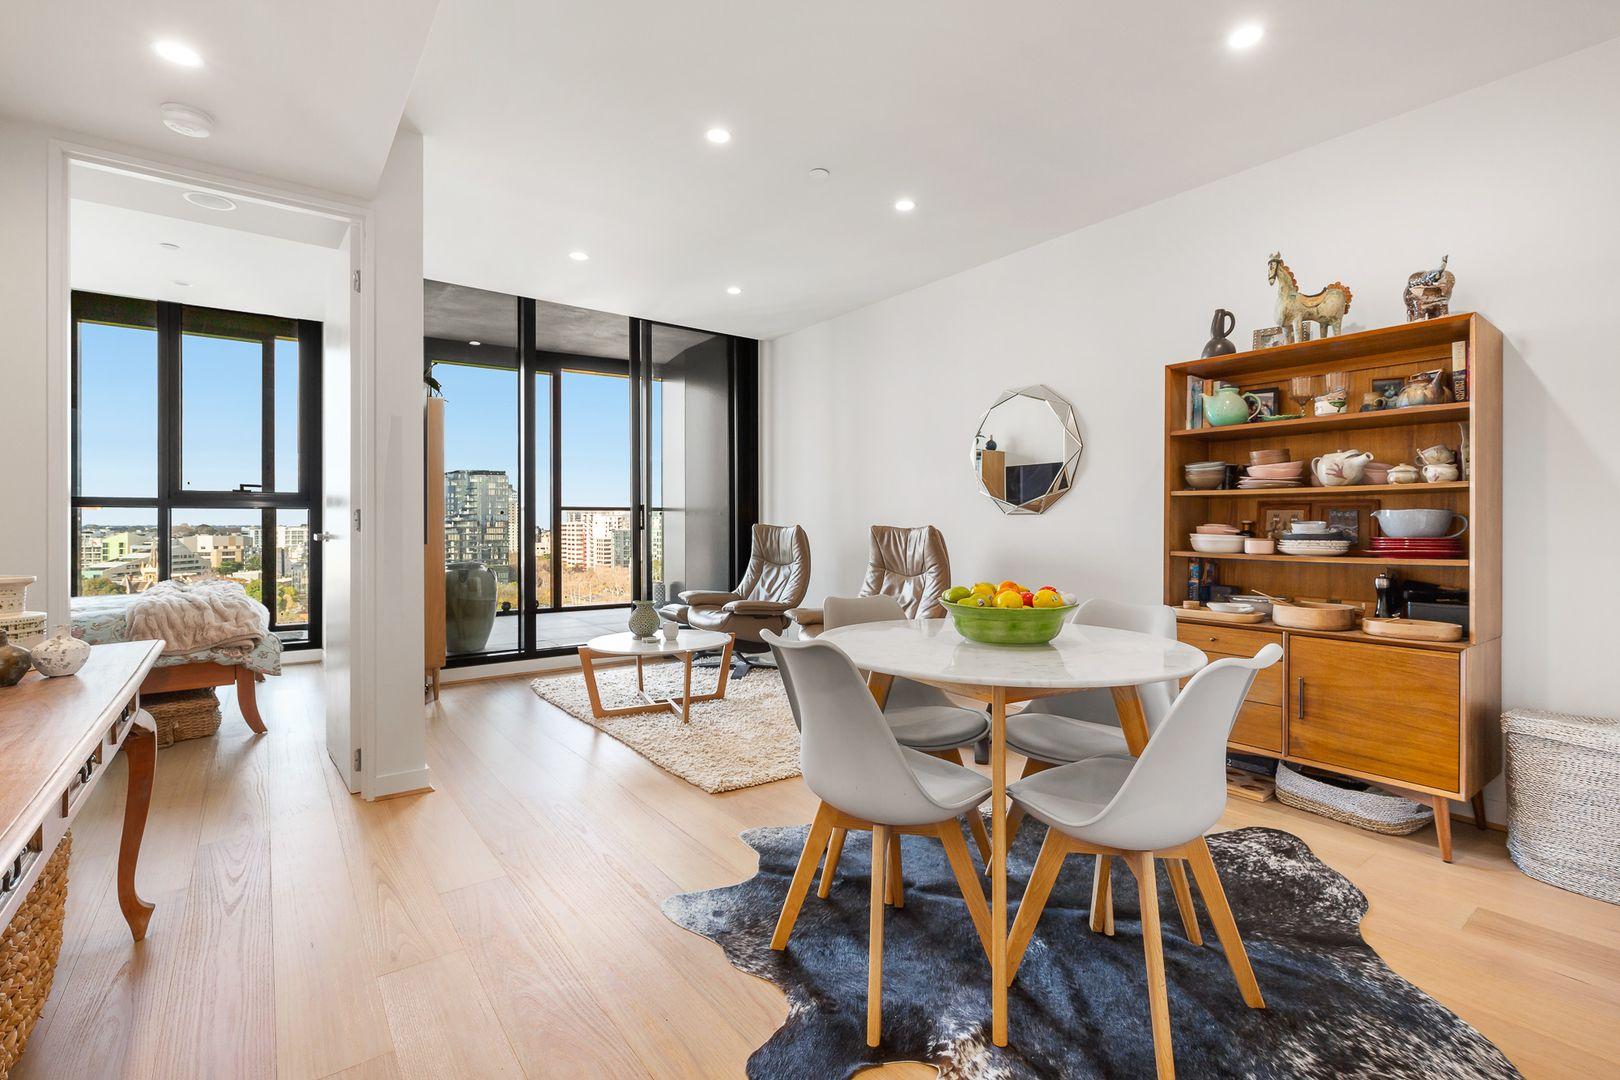 2 bedrooms Apartment / Unit / Flat in 1119/555 St Kilda Road MELBOURNE VIC, 3000